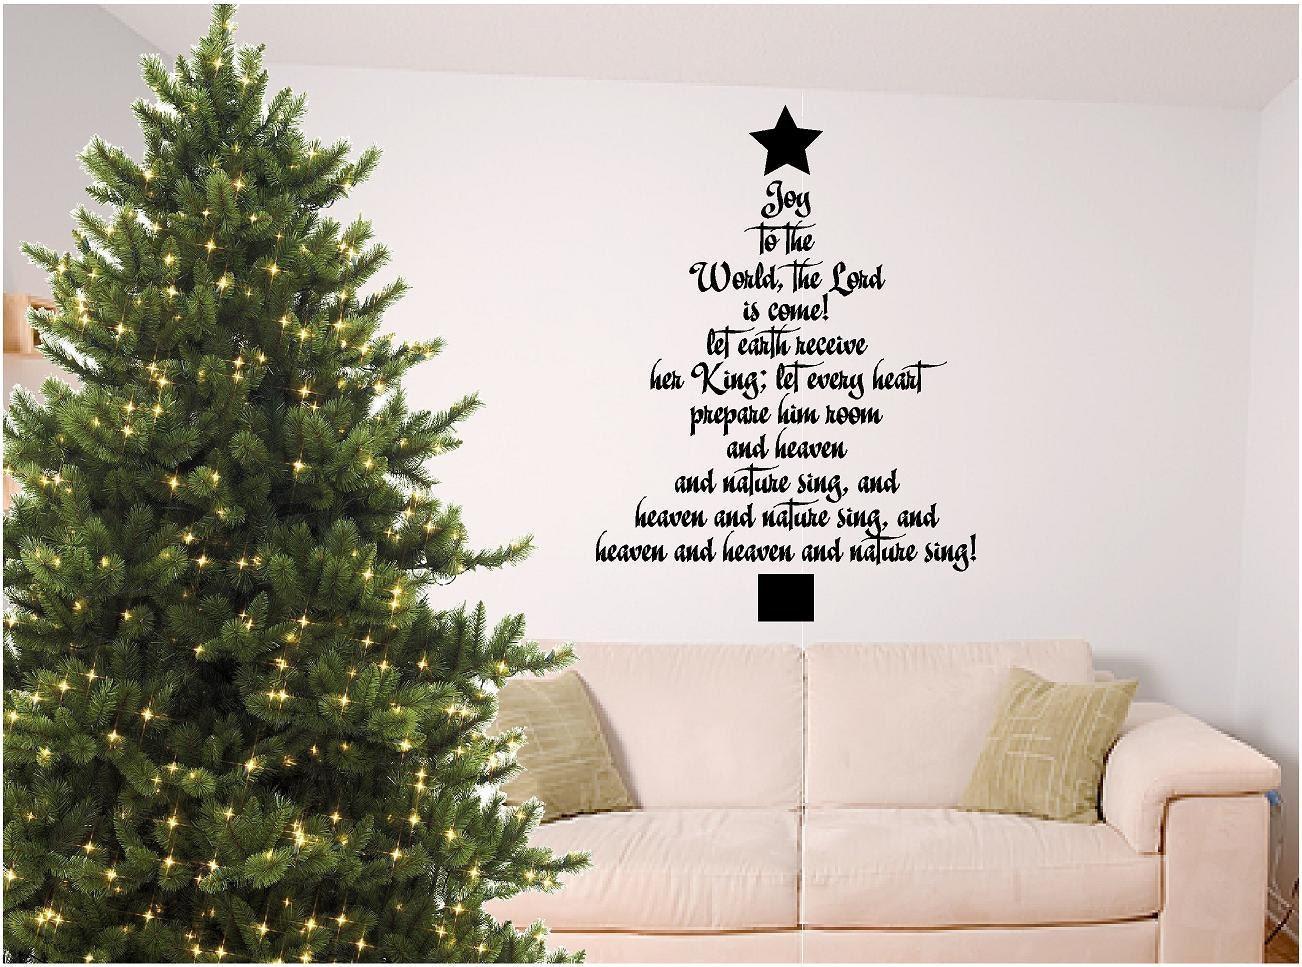 Superieur Christmas Bible Verse Wall Art Joy To The World